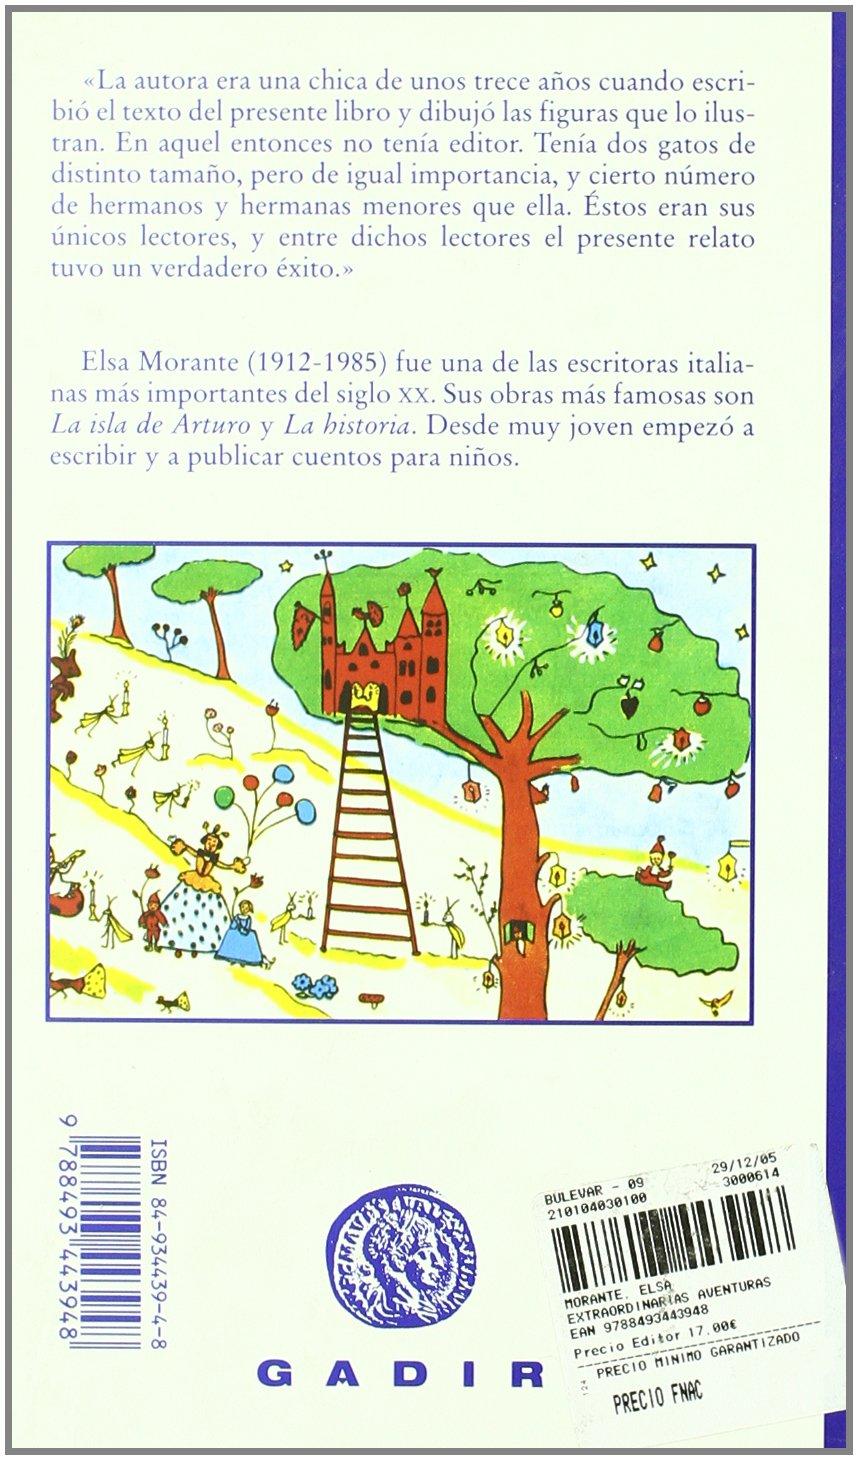 Las extraordinarias aventuras de Caterina (Spanish Edition): Elsa Morante: 9788493443948: Amazon.com: Books